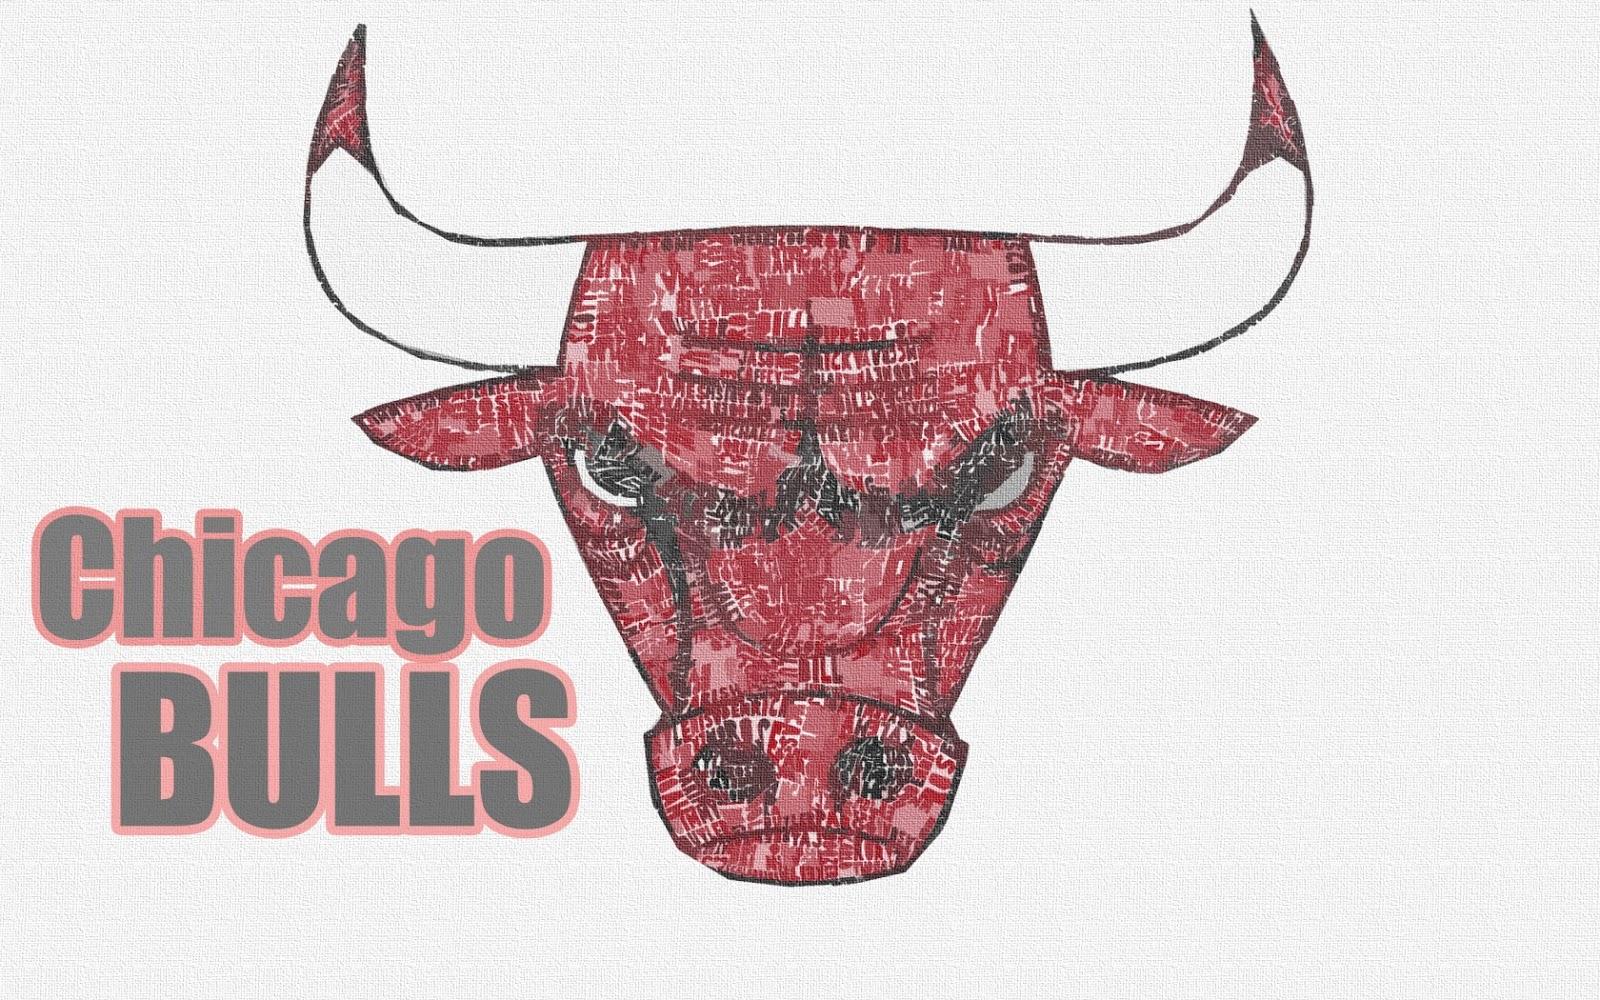 Chicago bulls basketball club logos 2013 its all about basketball chicago bulls basketball club logo voltagebd Images